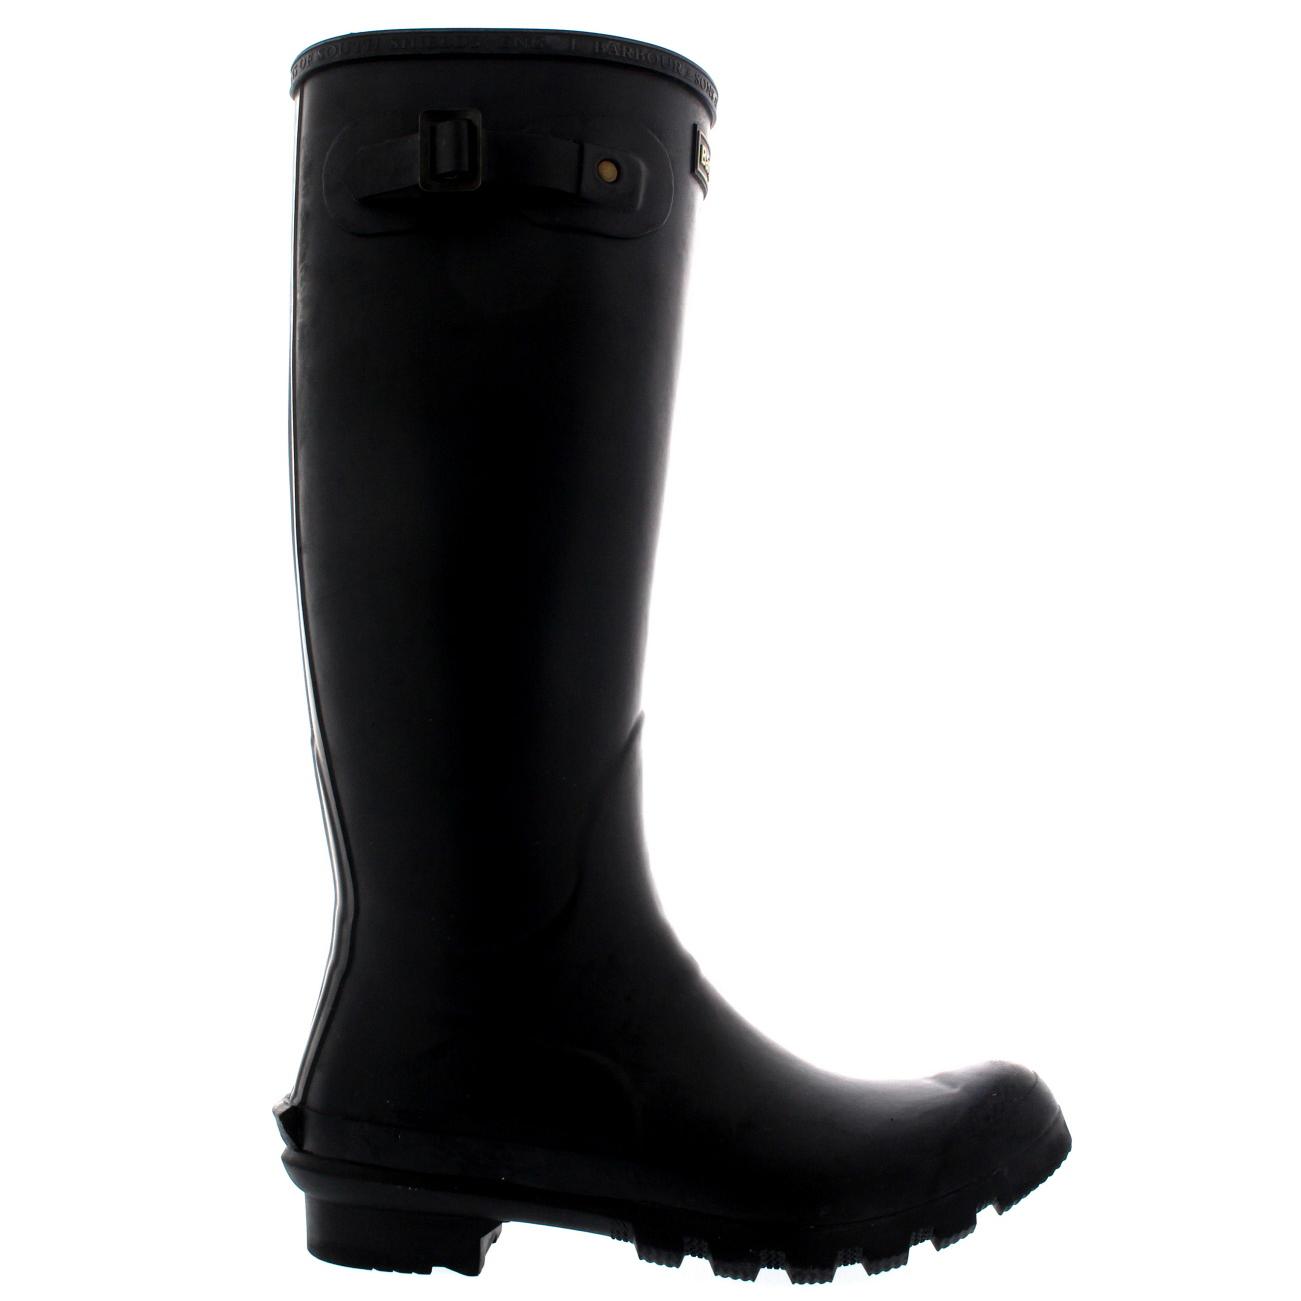 Womens-Barbour-Bede-Snow-Waterproof-Winter-Wellingtons-Mid-Calf-Boots-US-5-11 thumbnail 13